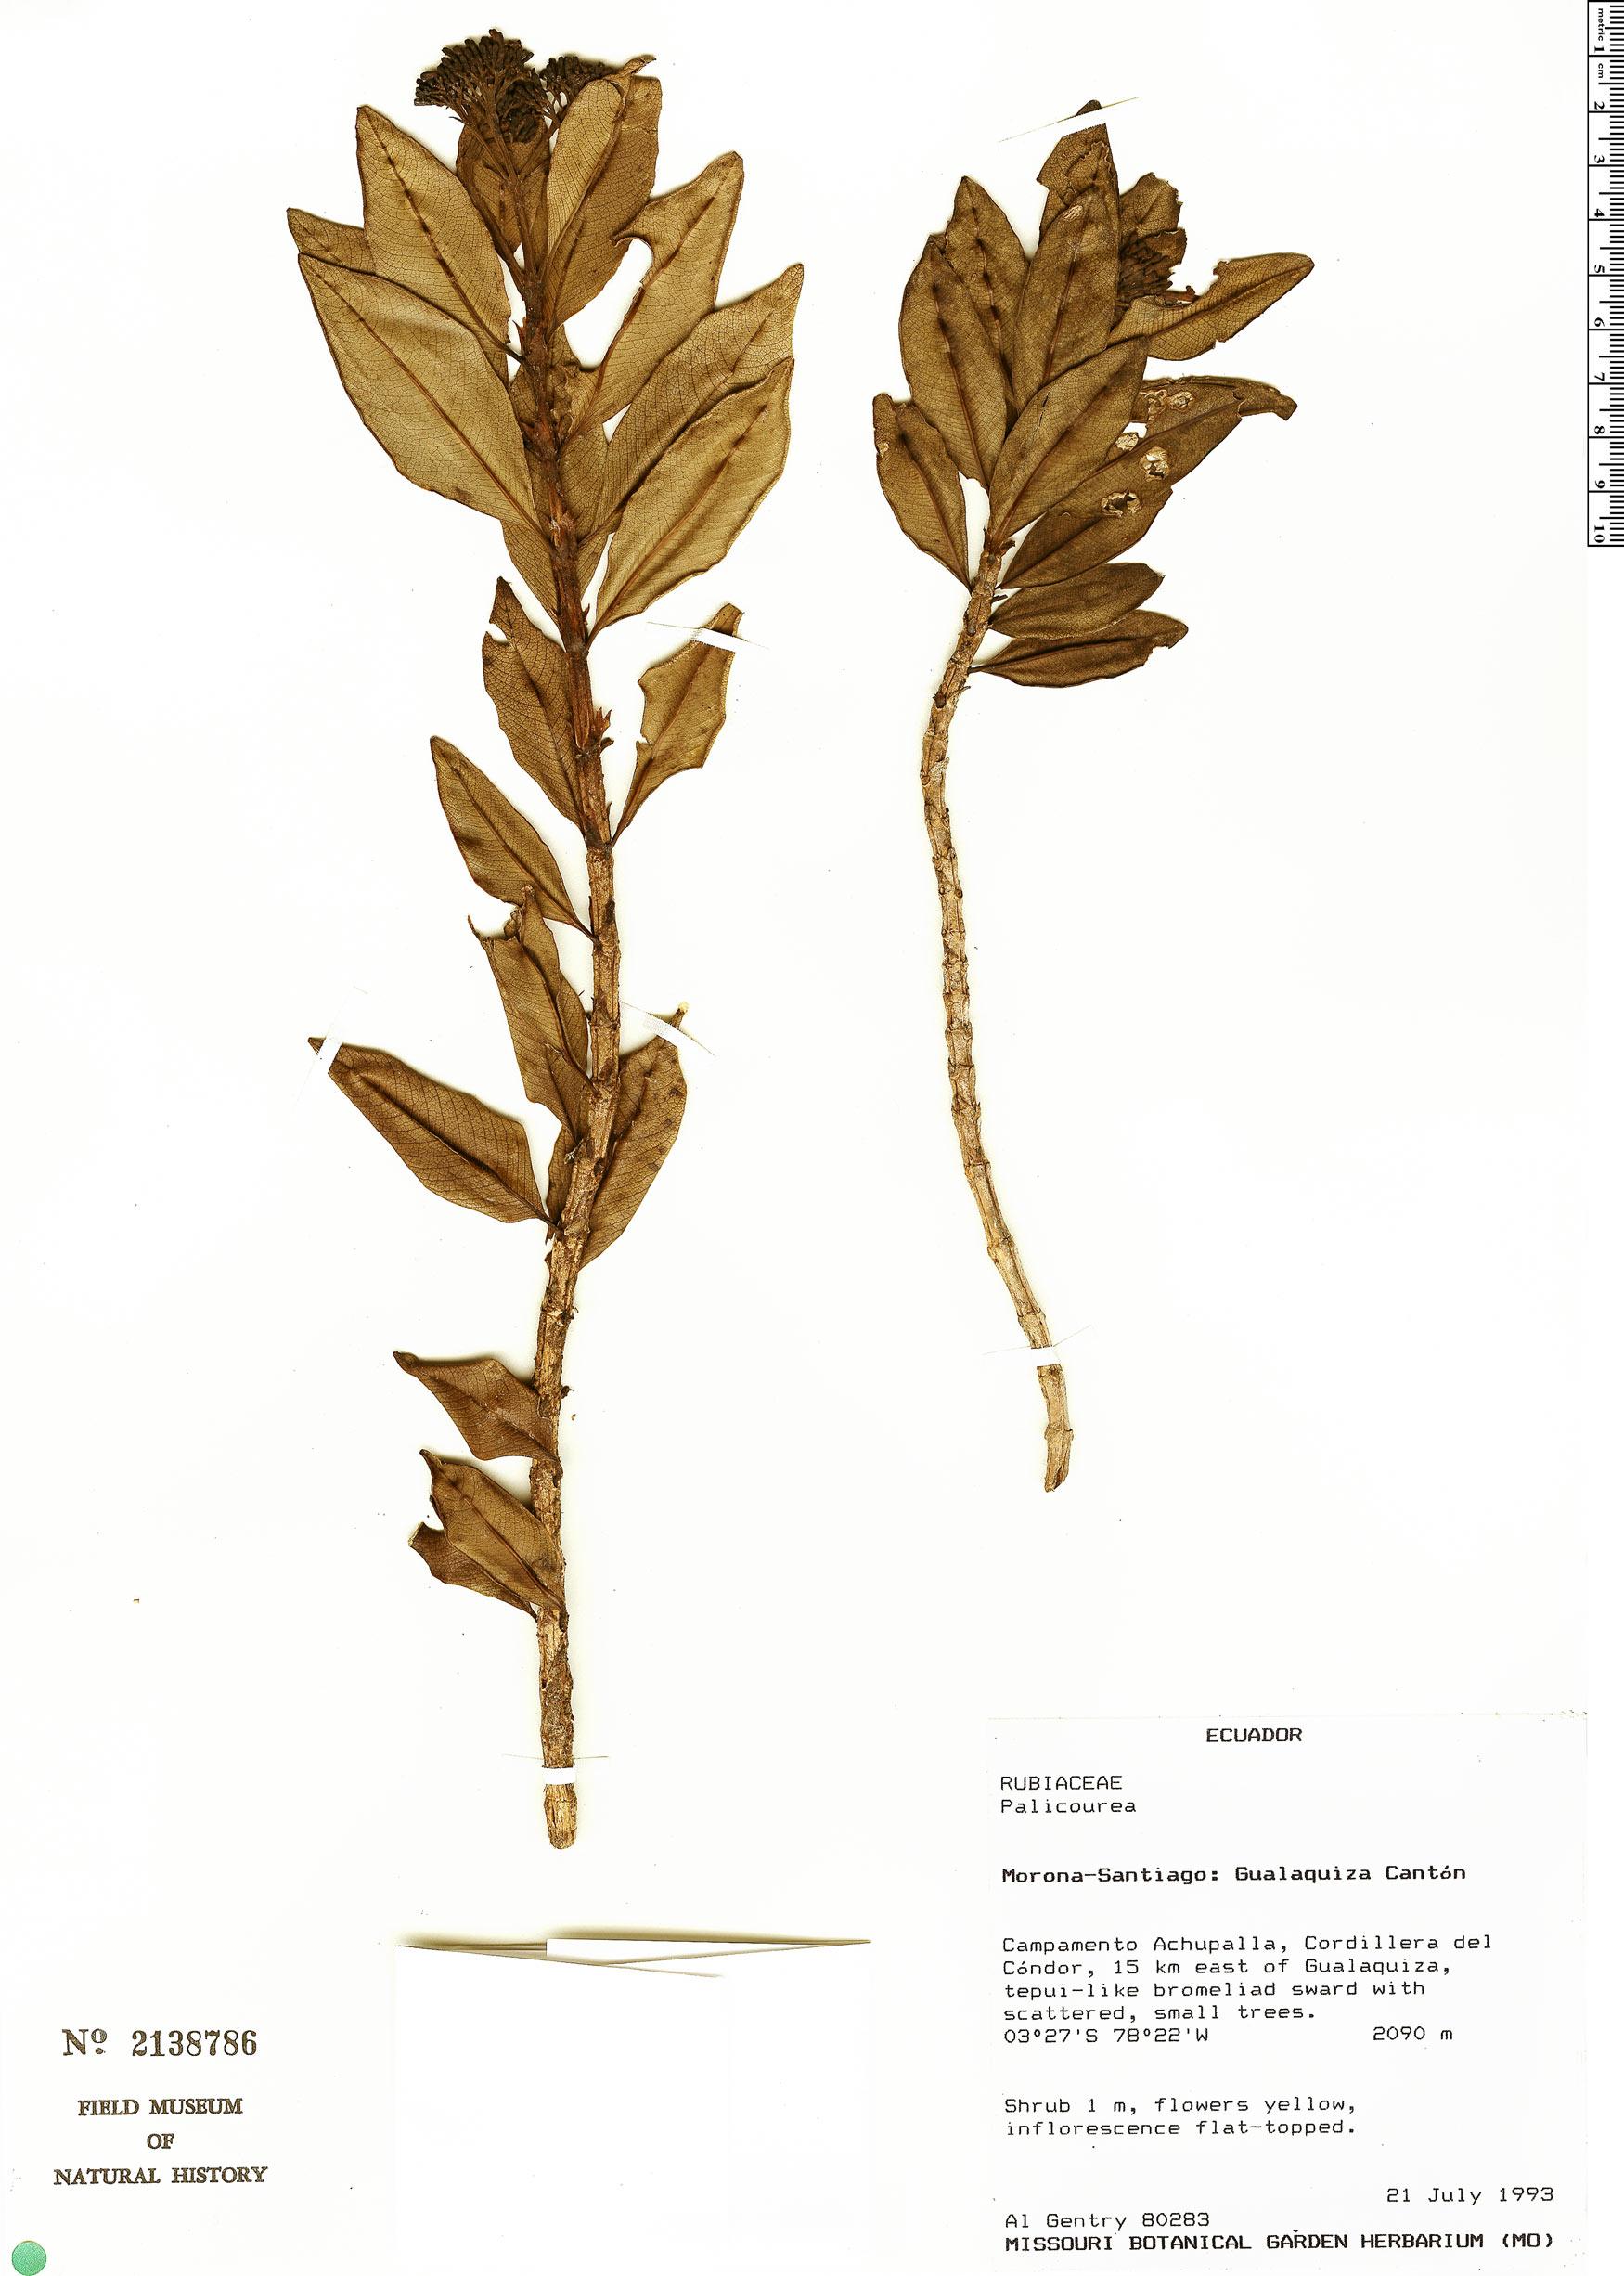 Specimen: Palicourea loxensis